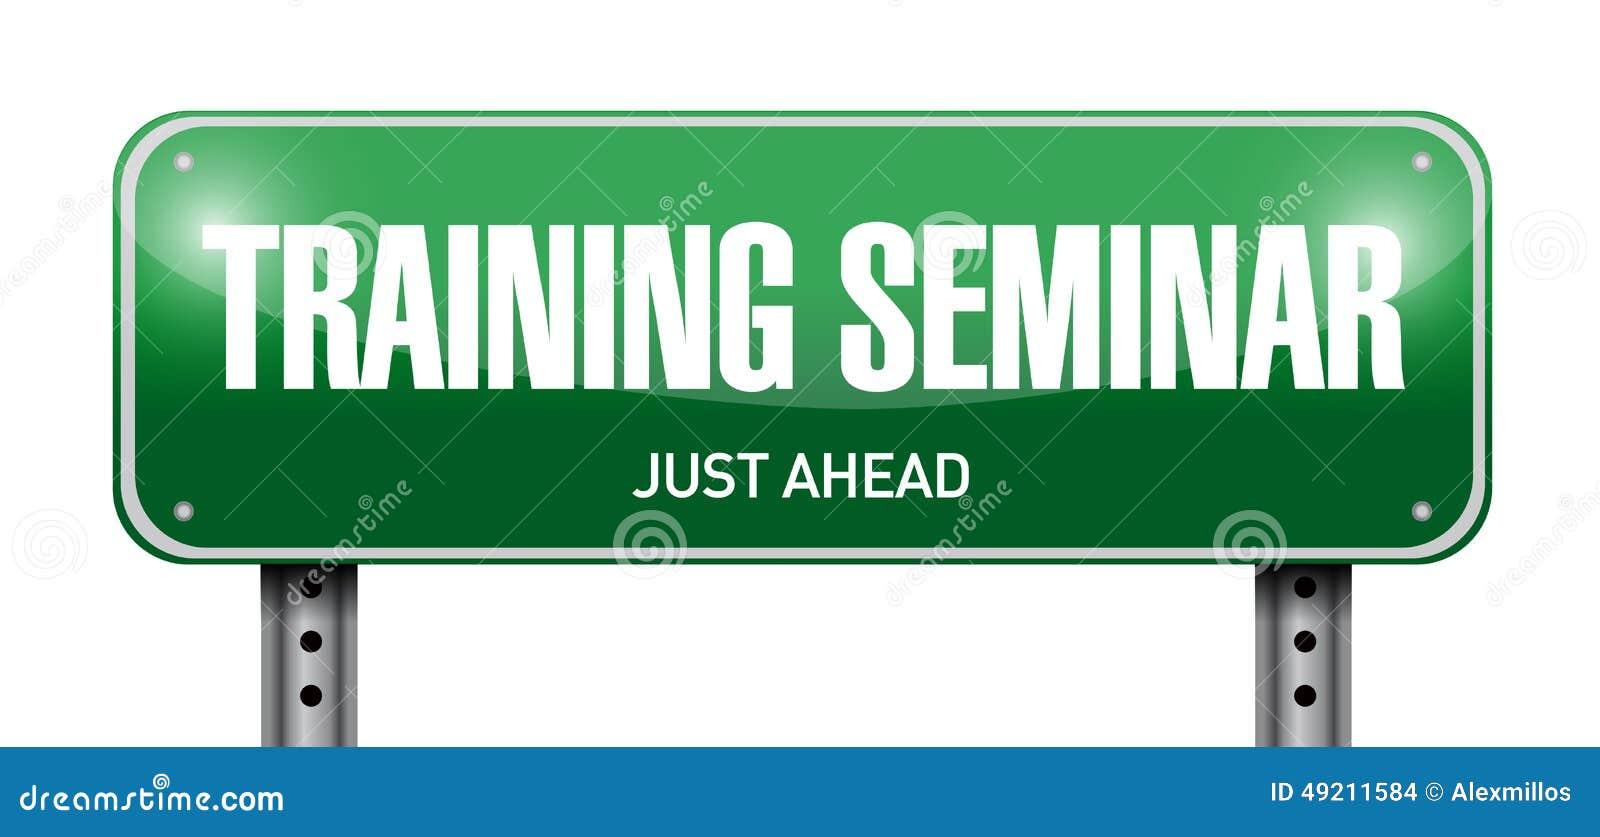 Training Seminar Road Sign Illustration Stock Photo ...